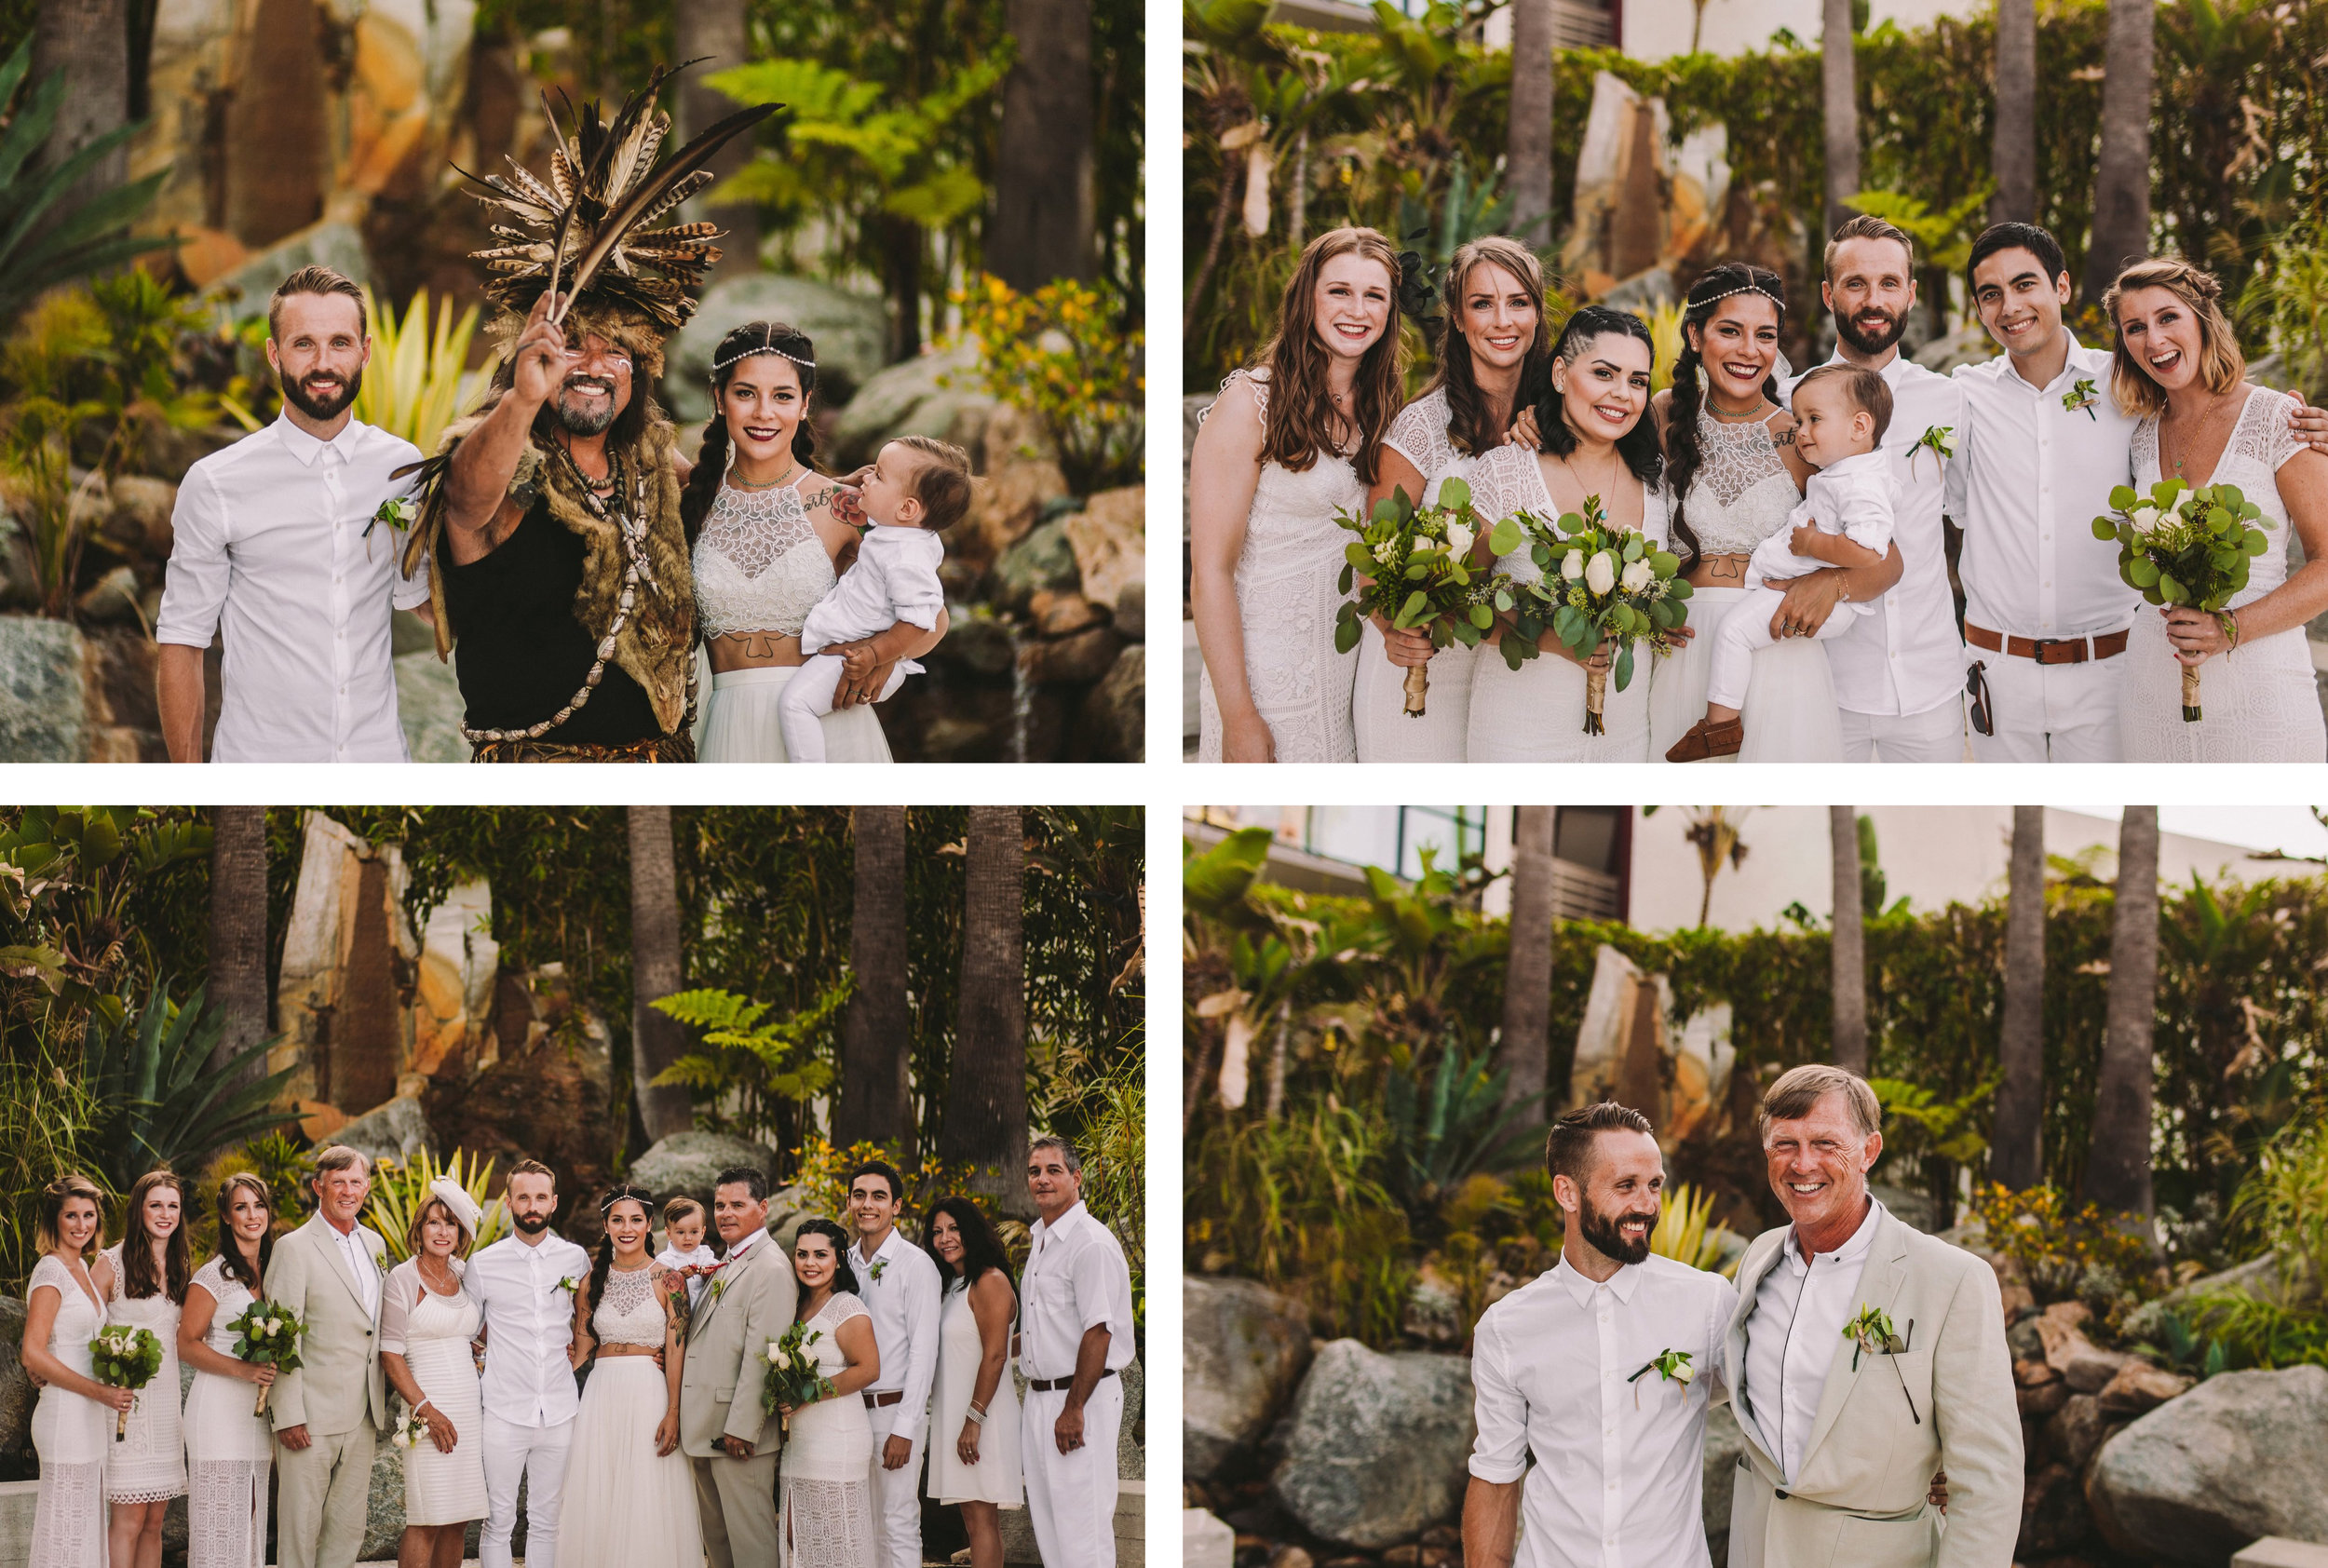 Hotel Maya Long Beach Native American Wedding 205 Collage 4.jpg